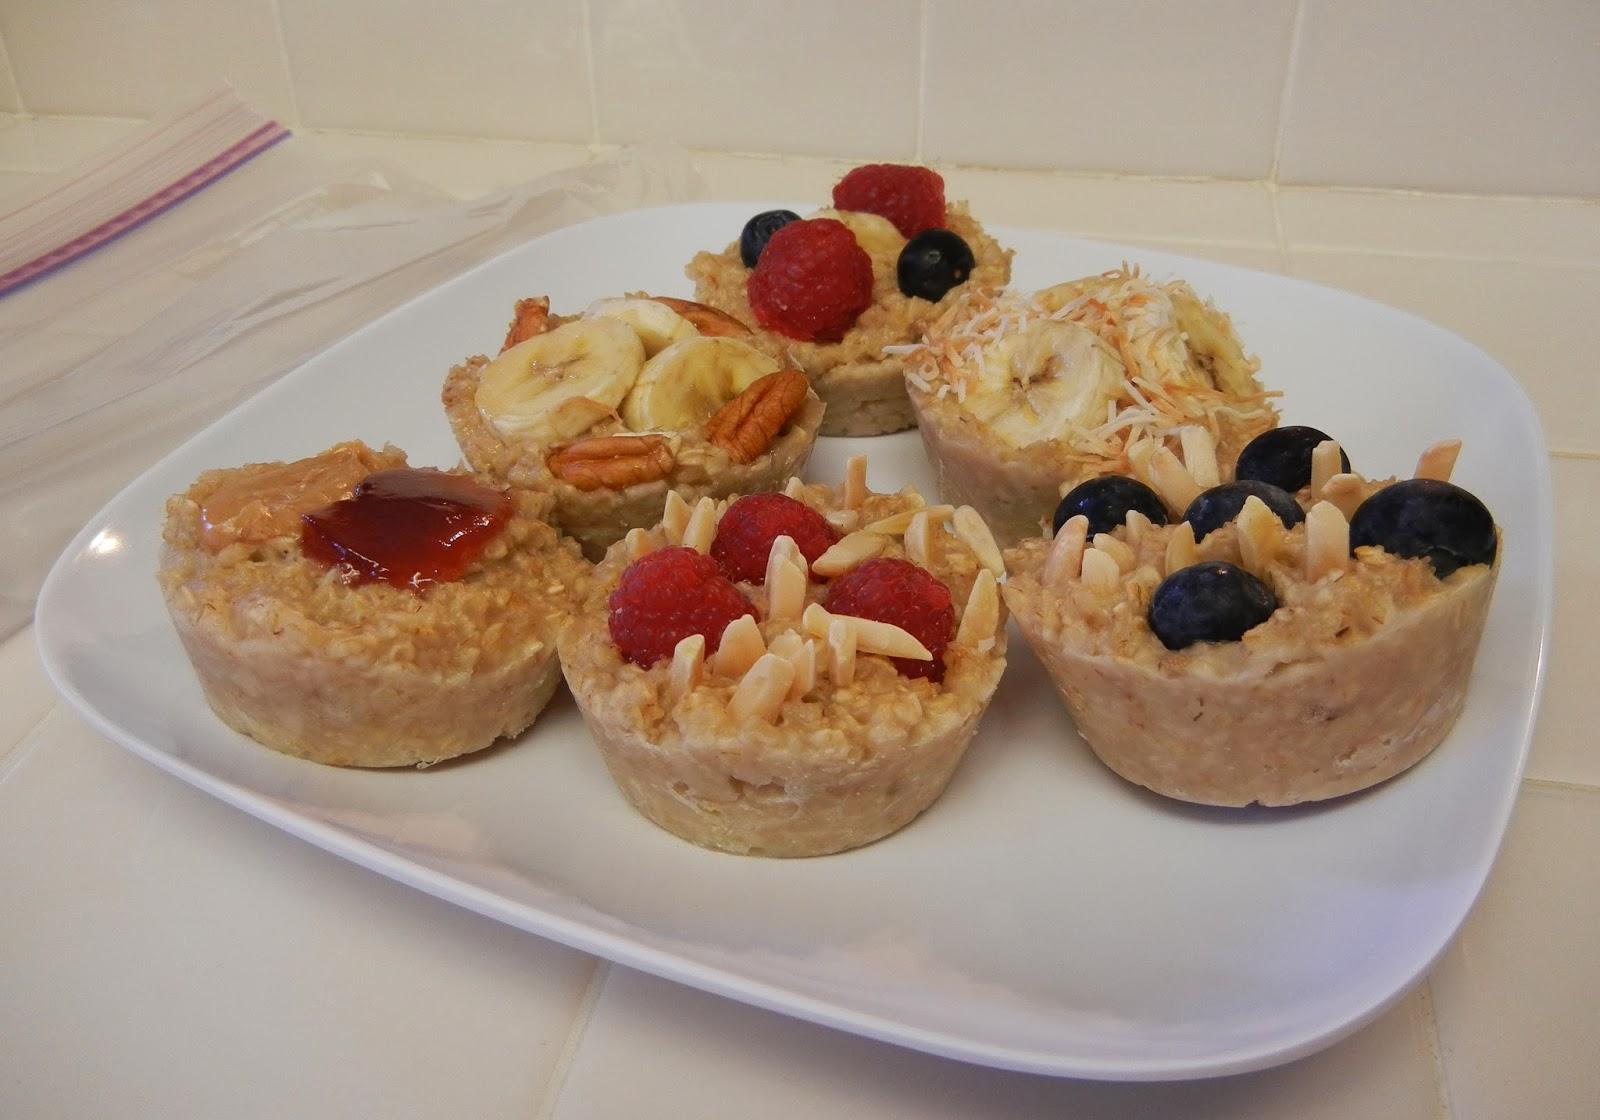 Eggface+Frozen+Oatmeal+Patties+4 Weight Loss Recipes Quick Breakfast: Frozen Oatmeal Discs